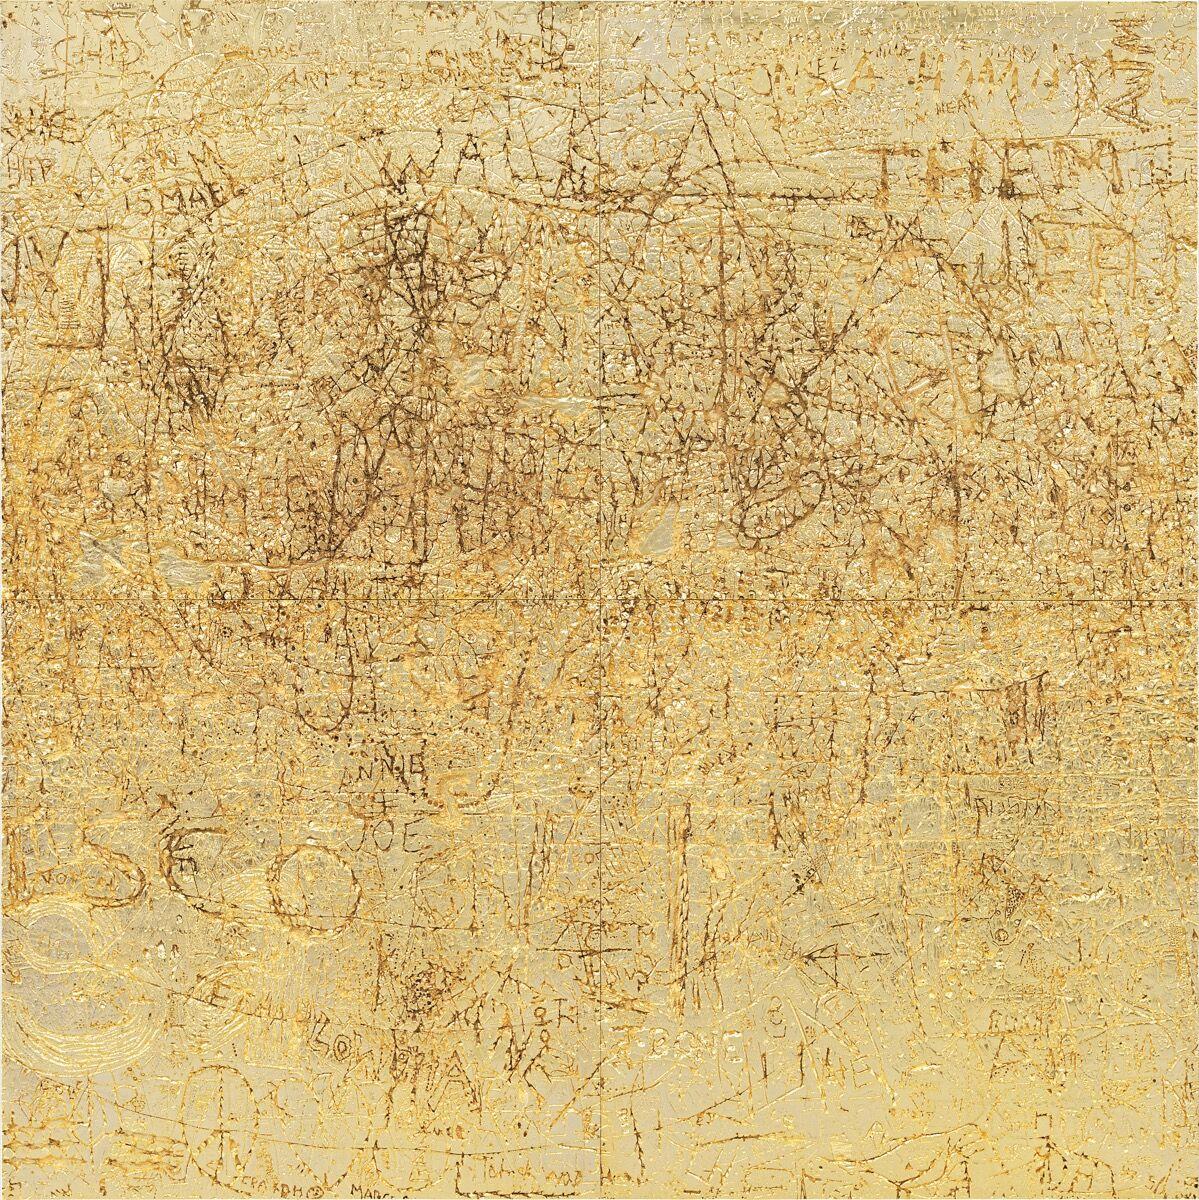 Rudolf Stingel, Untitled, 2012. Courtesy of Phillips / Phillips.com.